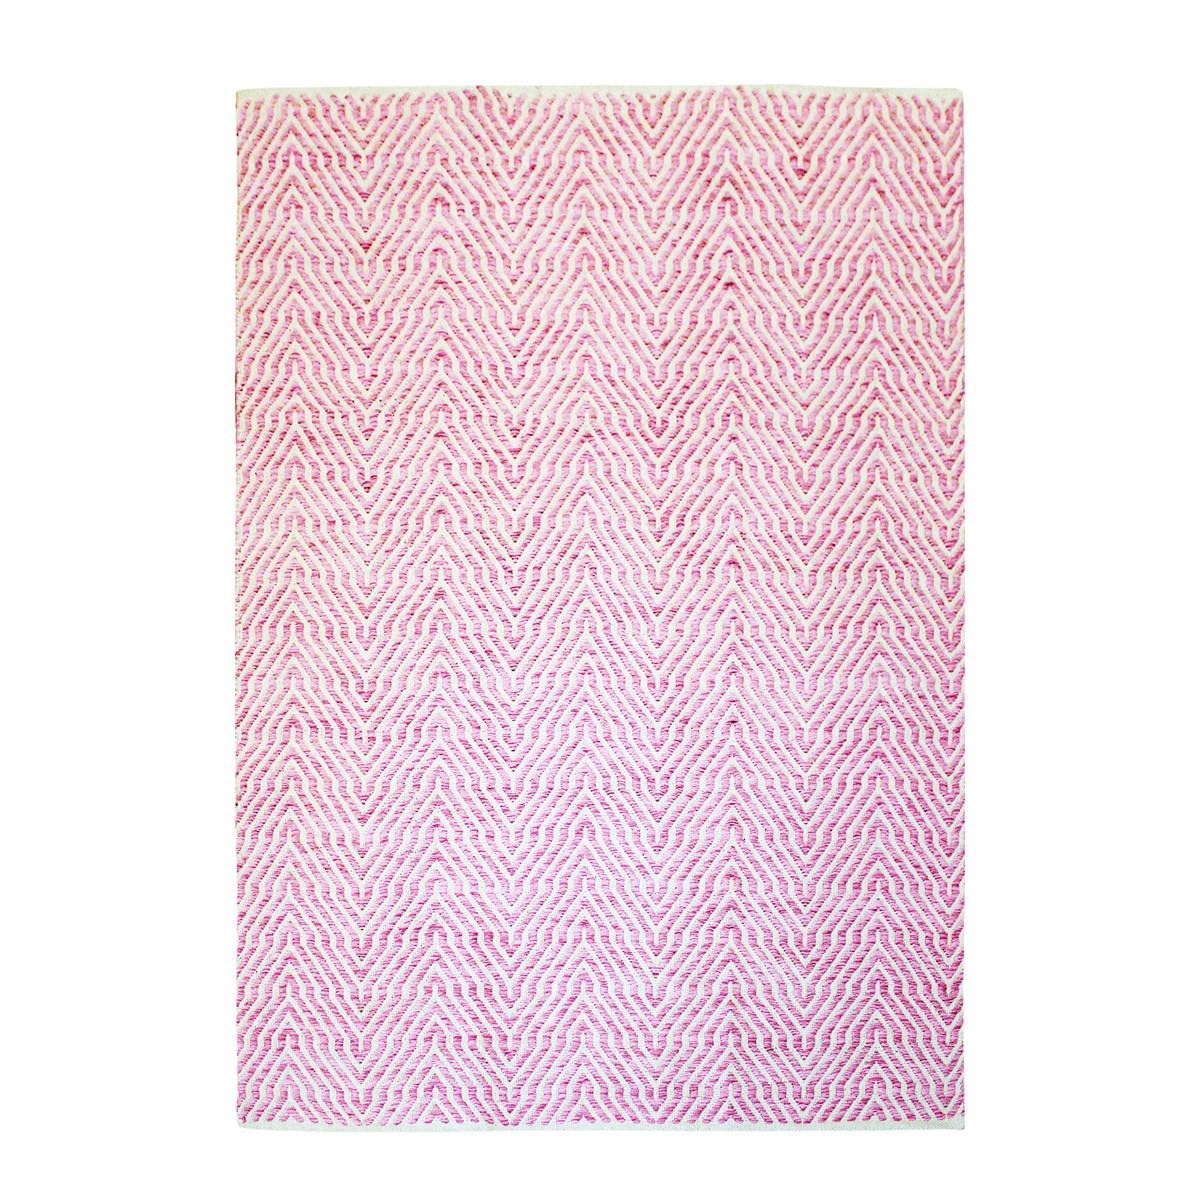 Tapis design en Coton Rose 160x230 cm